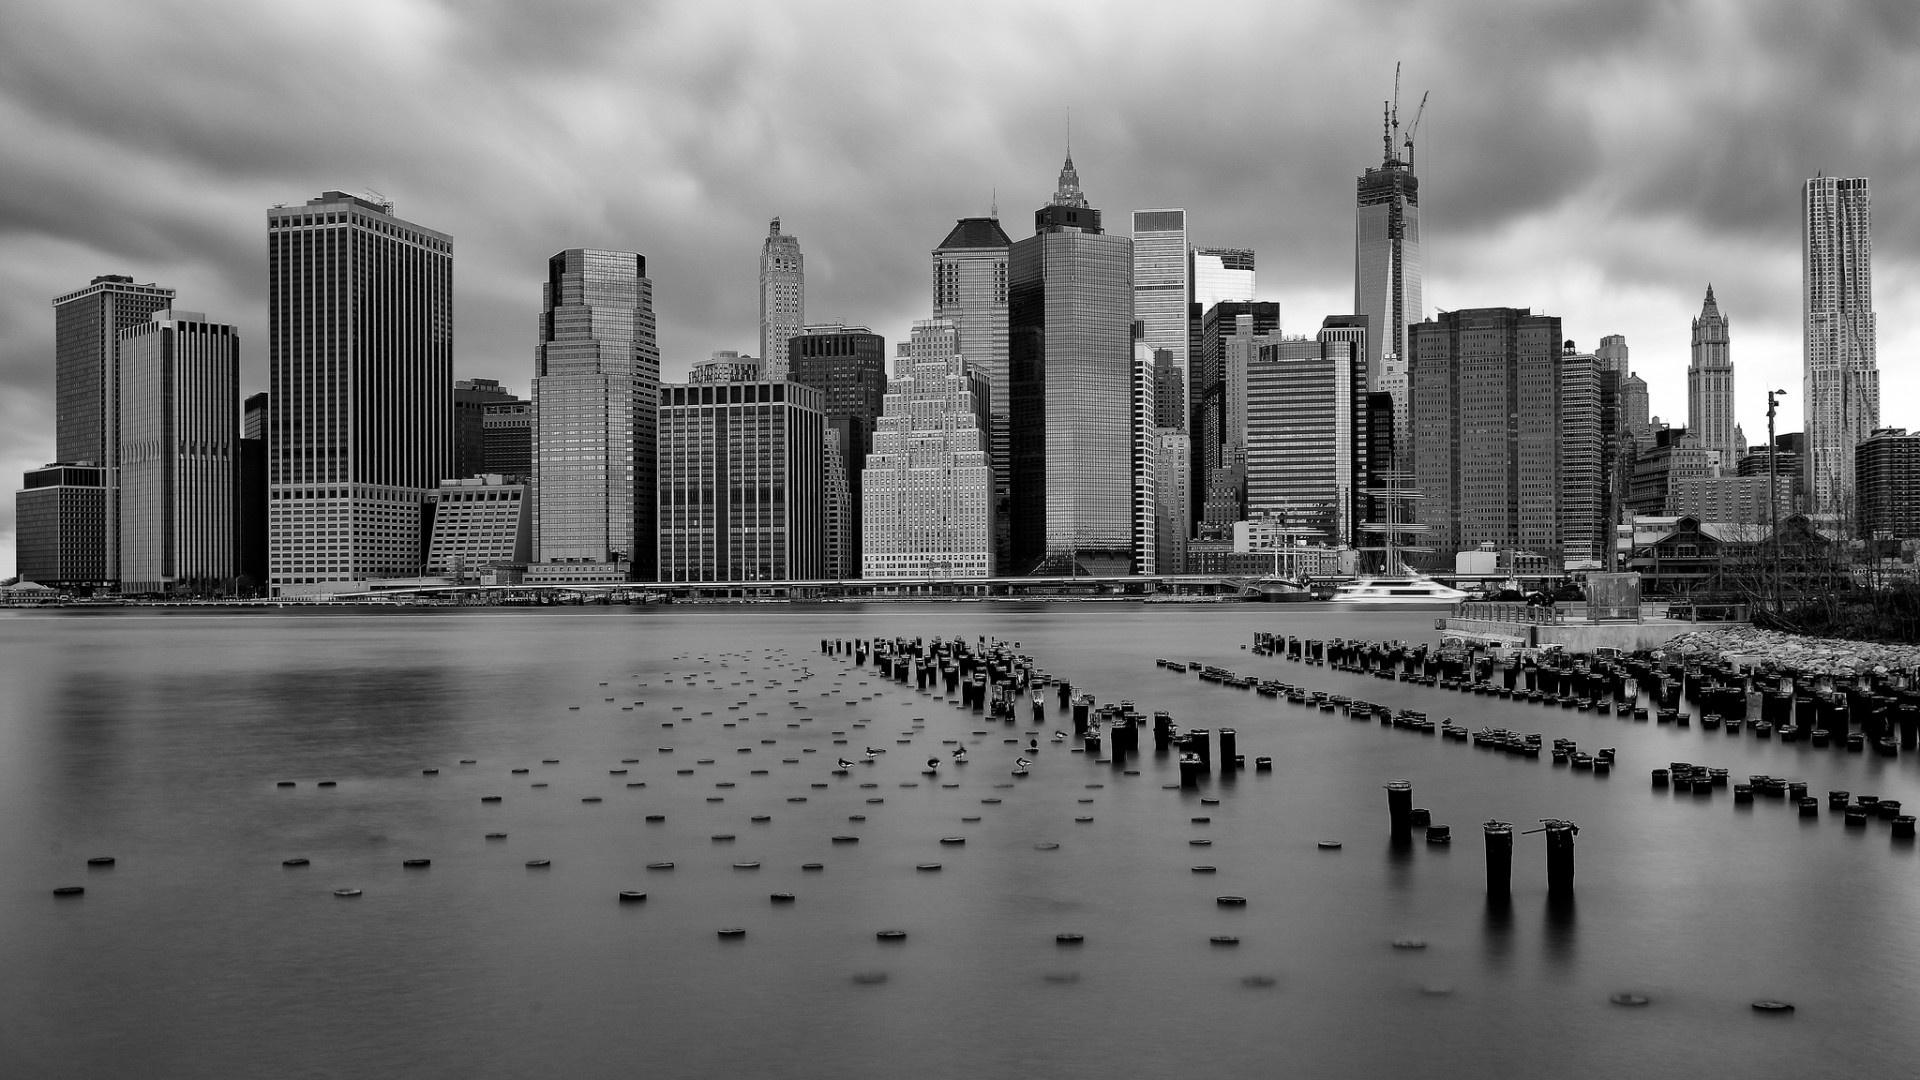 New York Wallpaper 1920x1080 Black And White